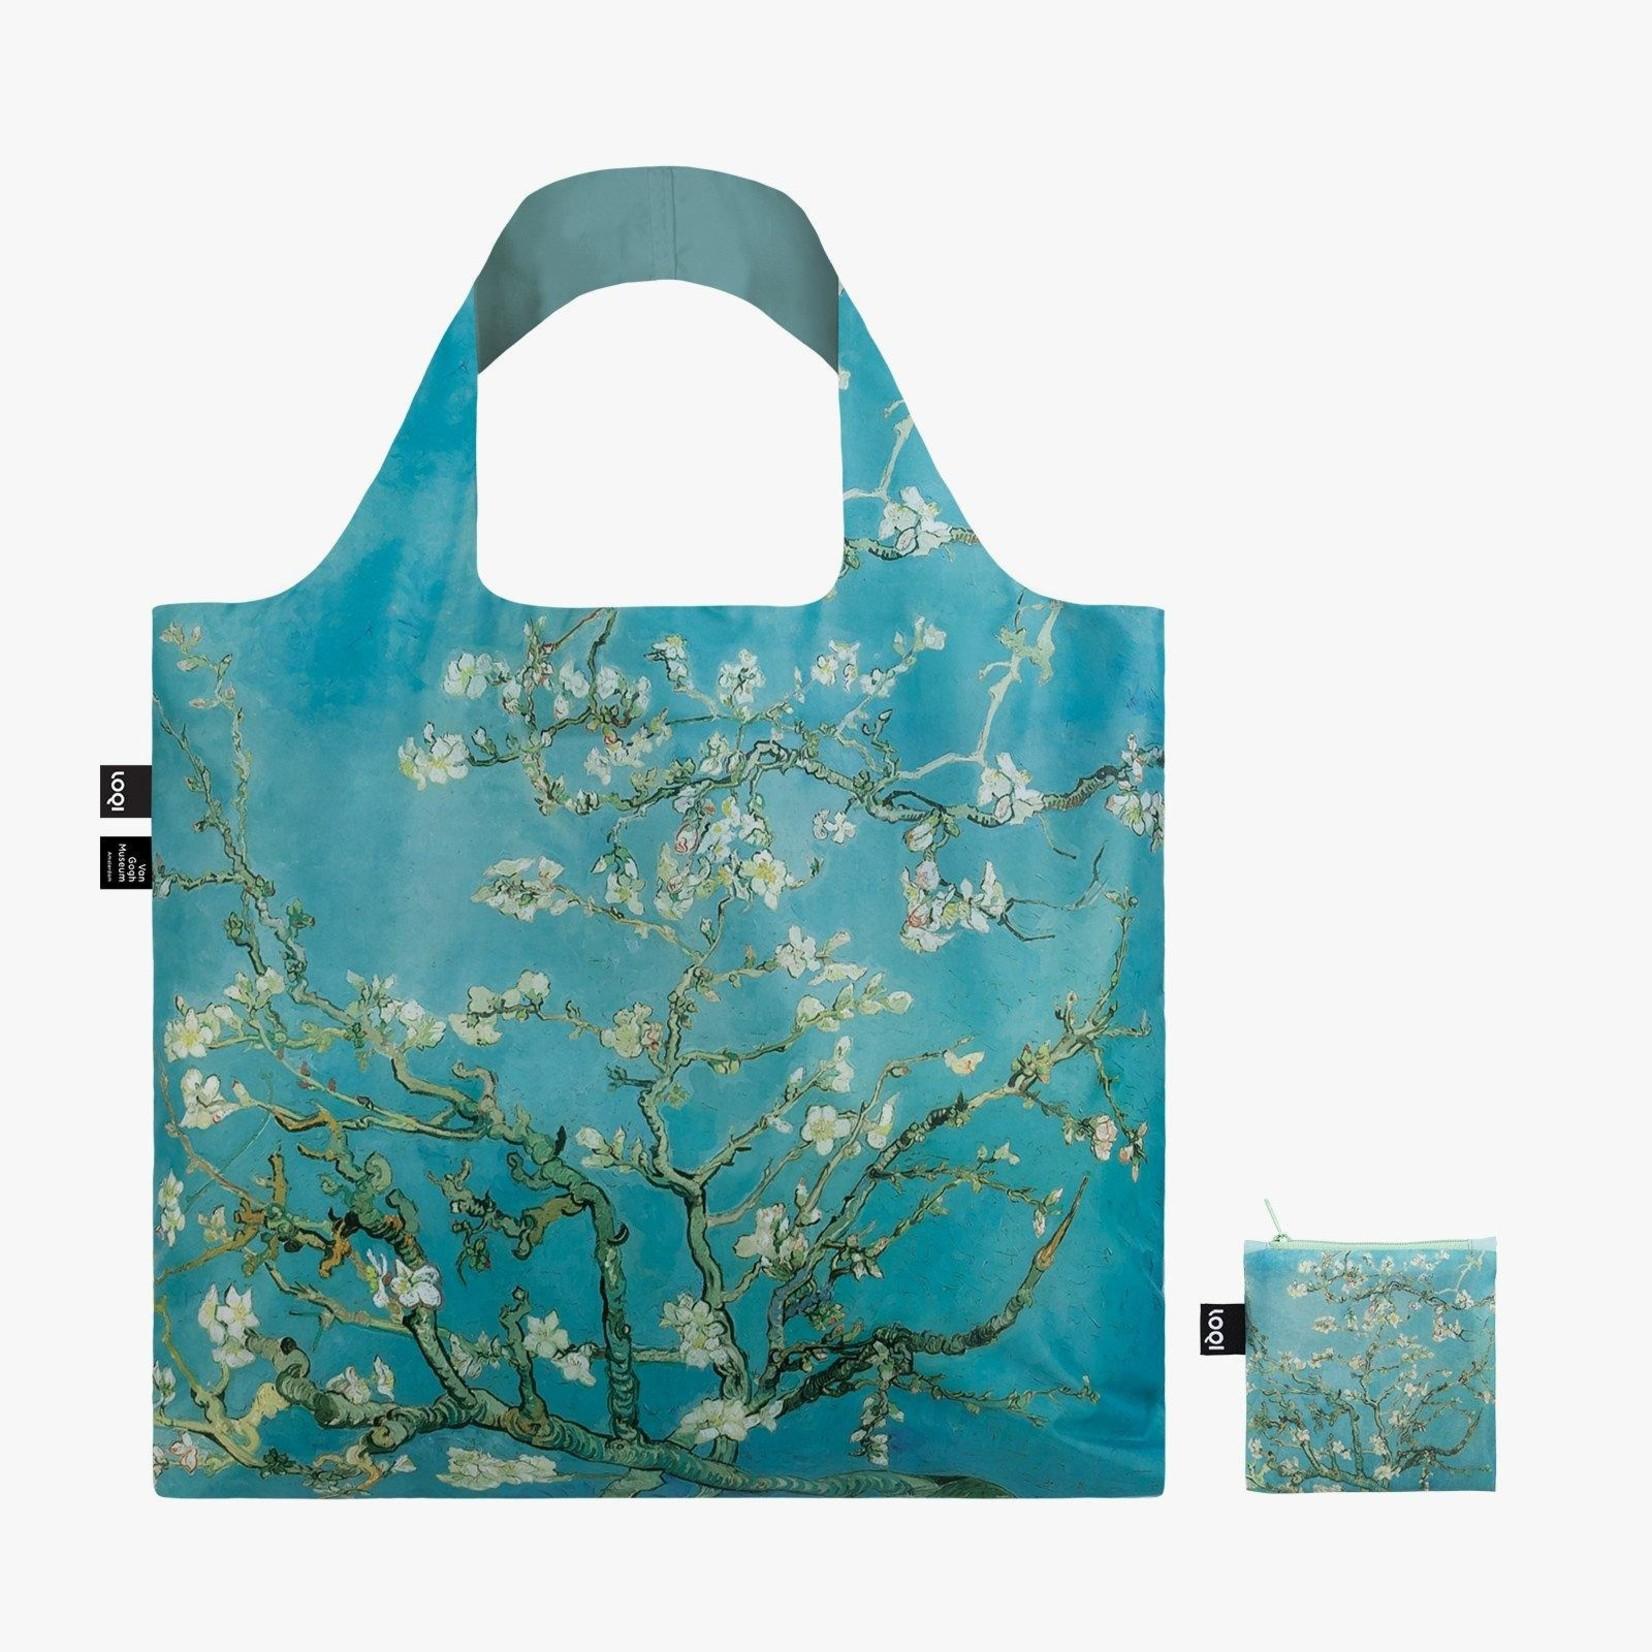 Loqi Bag: Almond Blossom